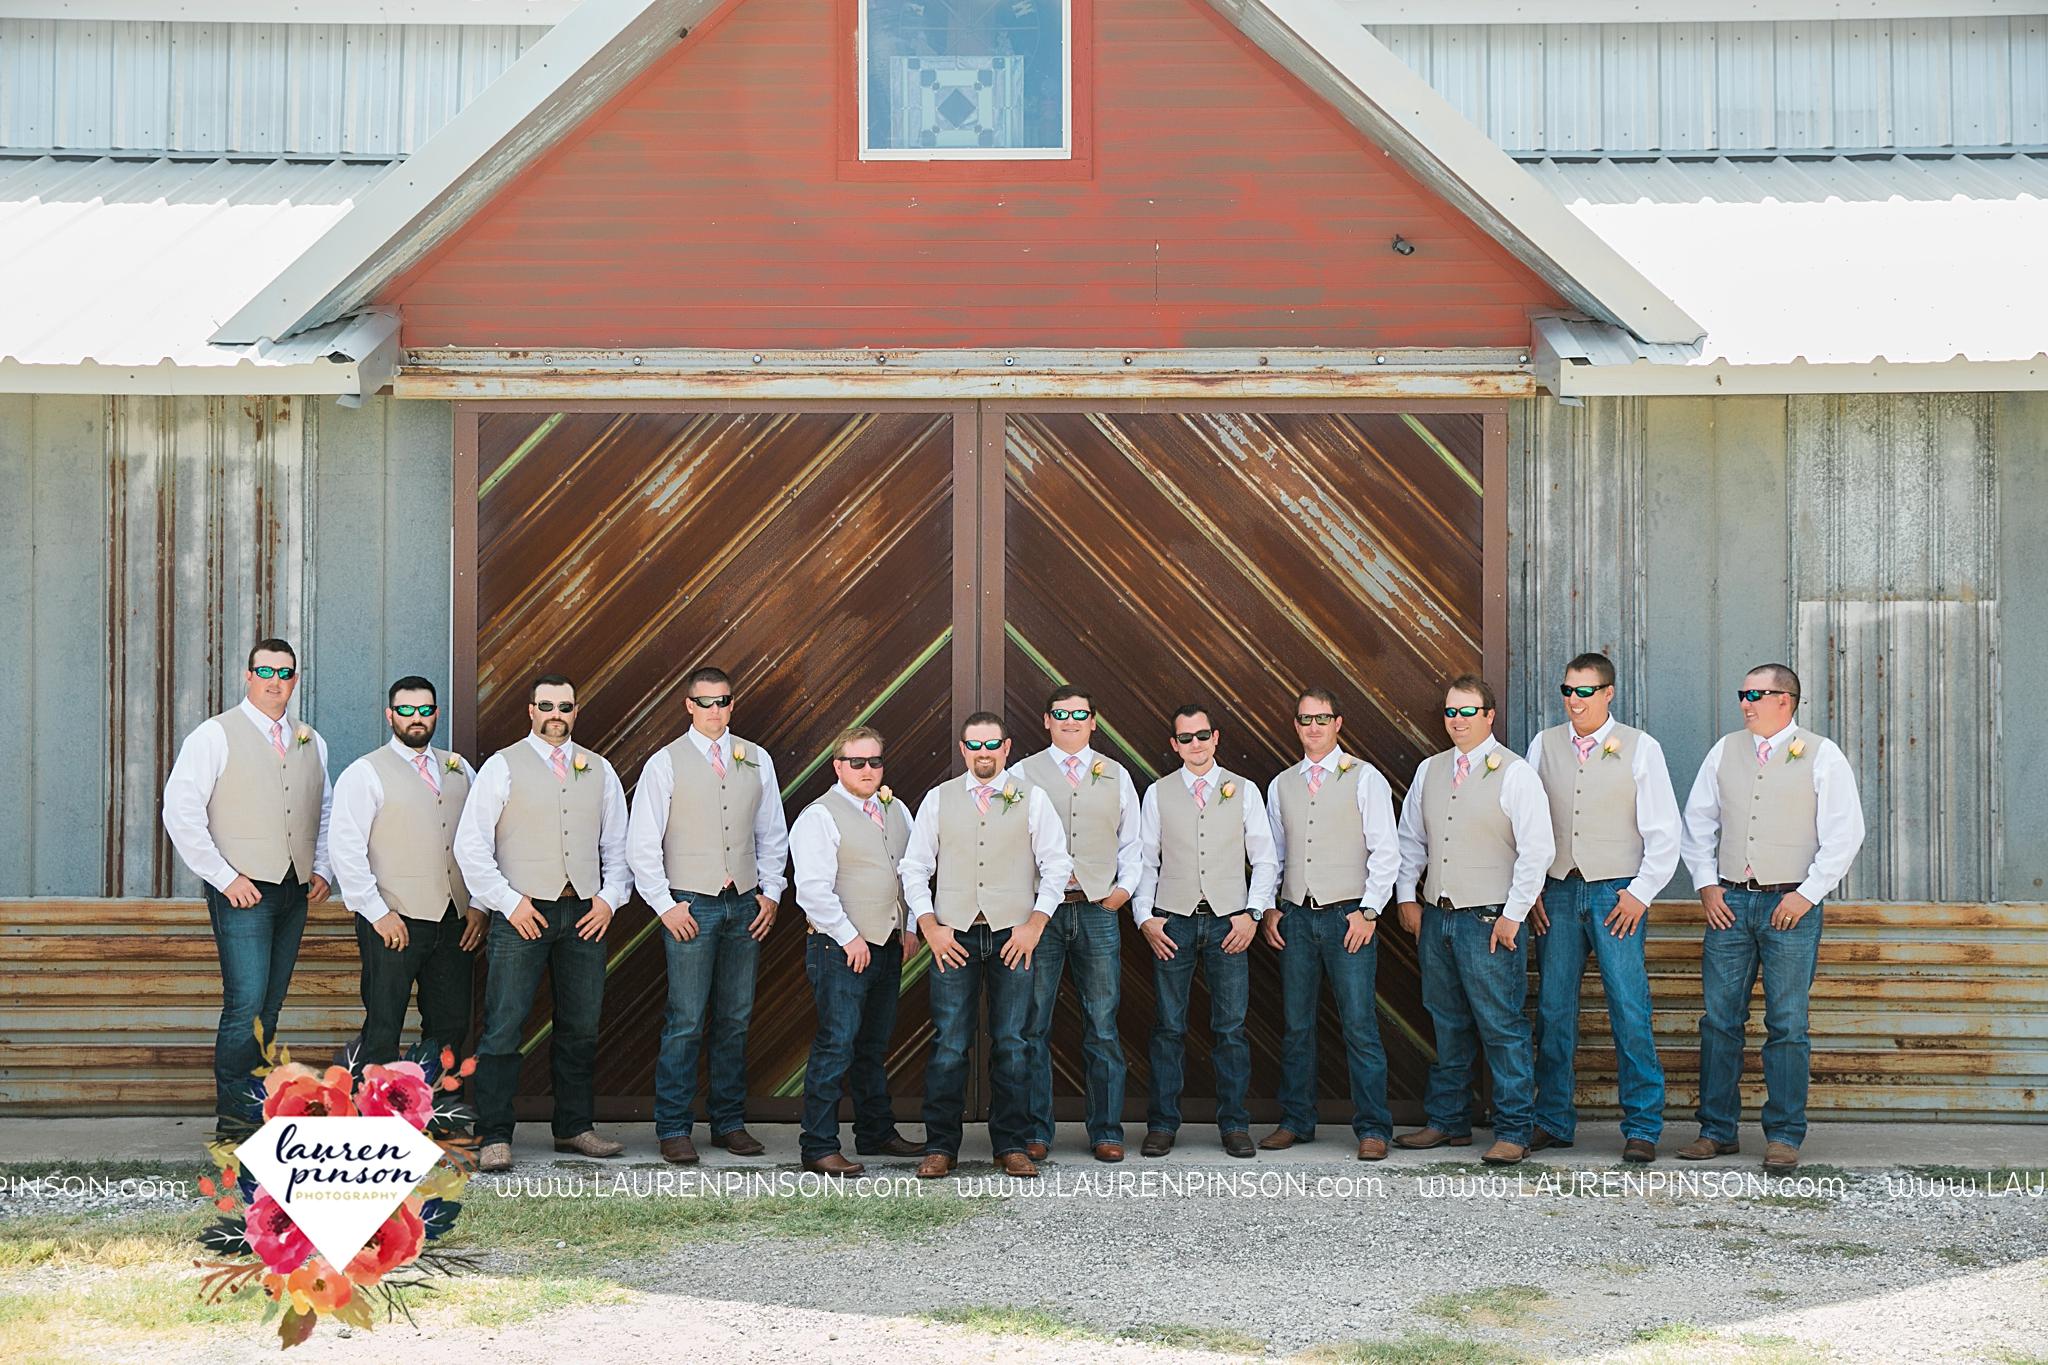 jones-barn-willow-creek-ranch-wedding-in-cleburne-texas-fort-worth-dfw-wichita-falls-wedding-photography_3216.jpg